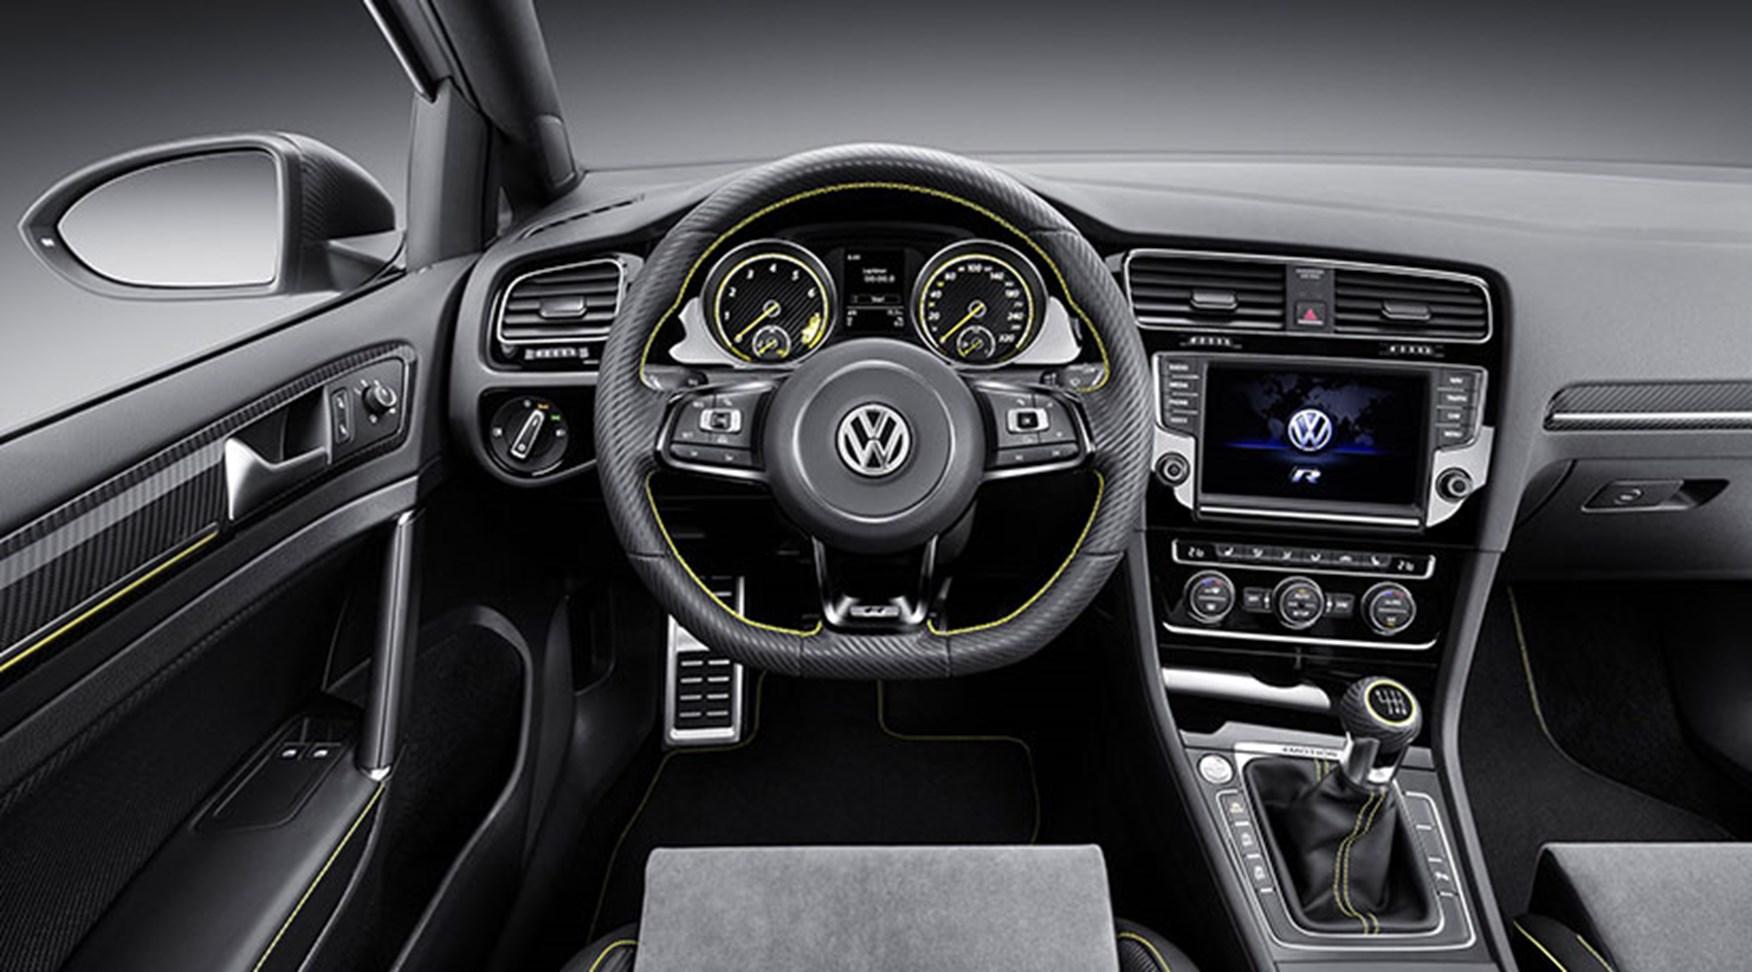 VW Golf R420 spy photos: best look yet at 2016